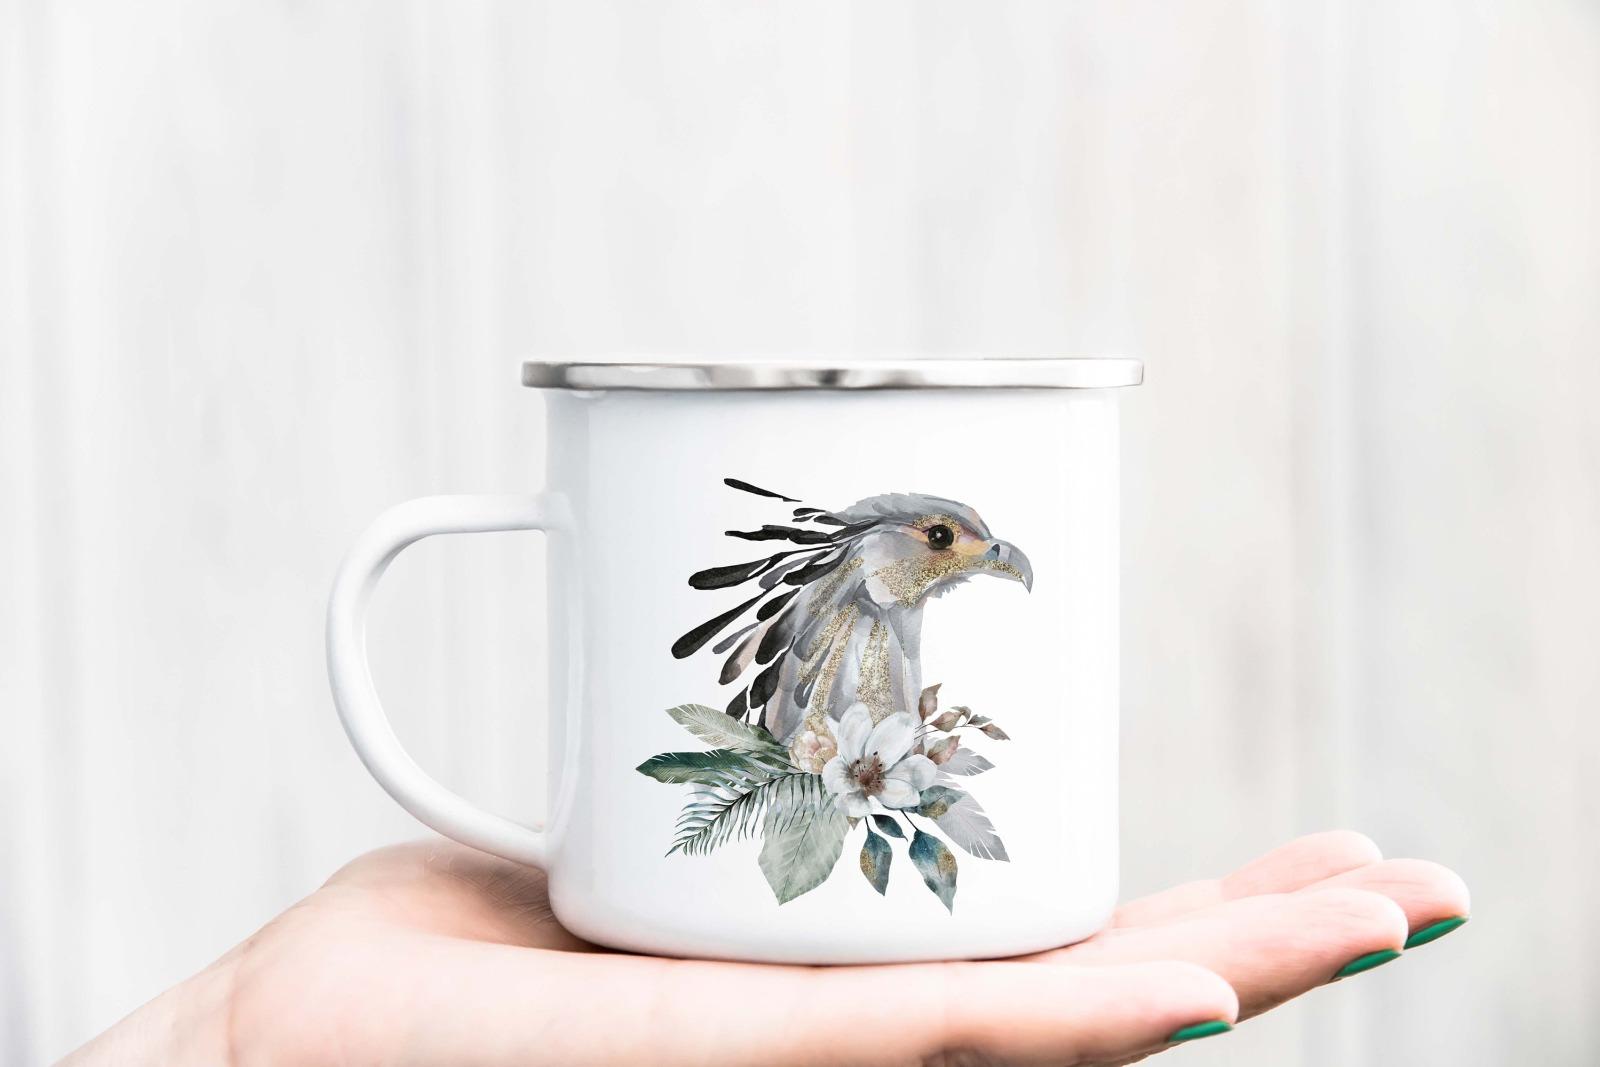 Tasse Aquarell-Tiere personalisiert mit Wunschname 9